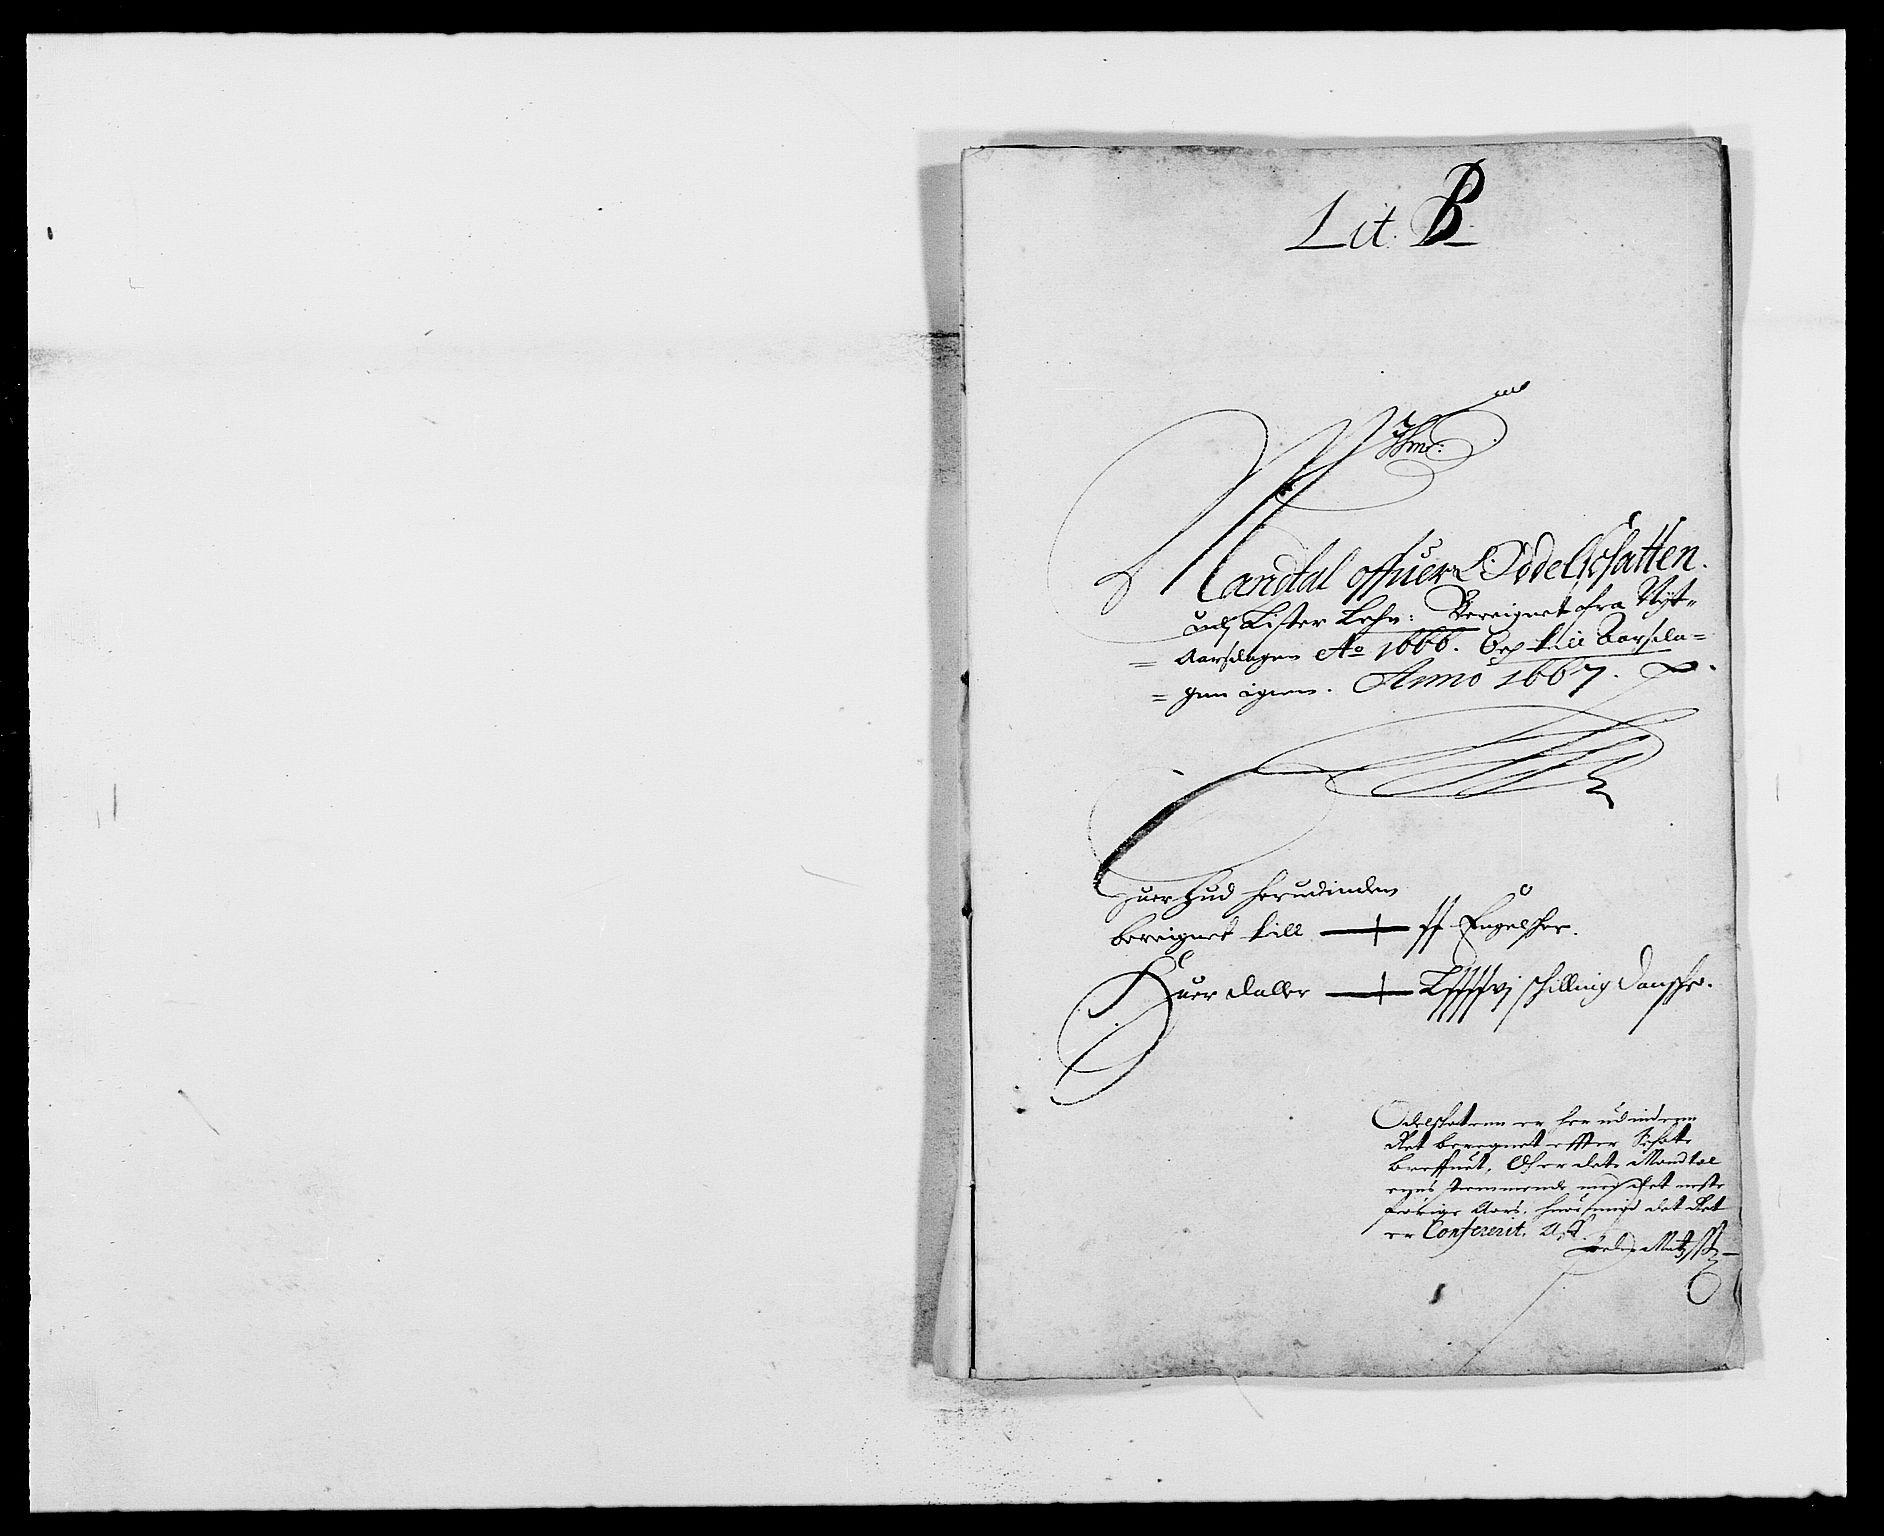 RA, Rentekammeret inntil 1814, Reviderte regnskaper, Fogderegnskap, R41/L2524: Fogderegnskap Lista, 1665-1668, s. 189